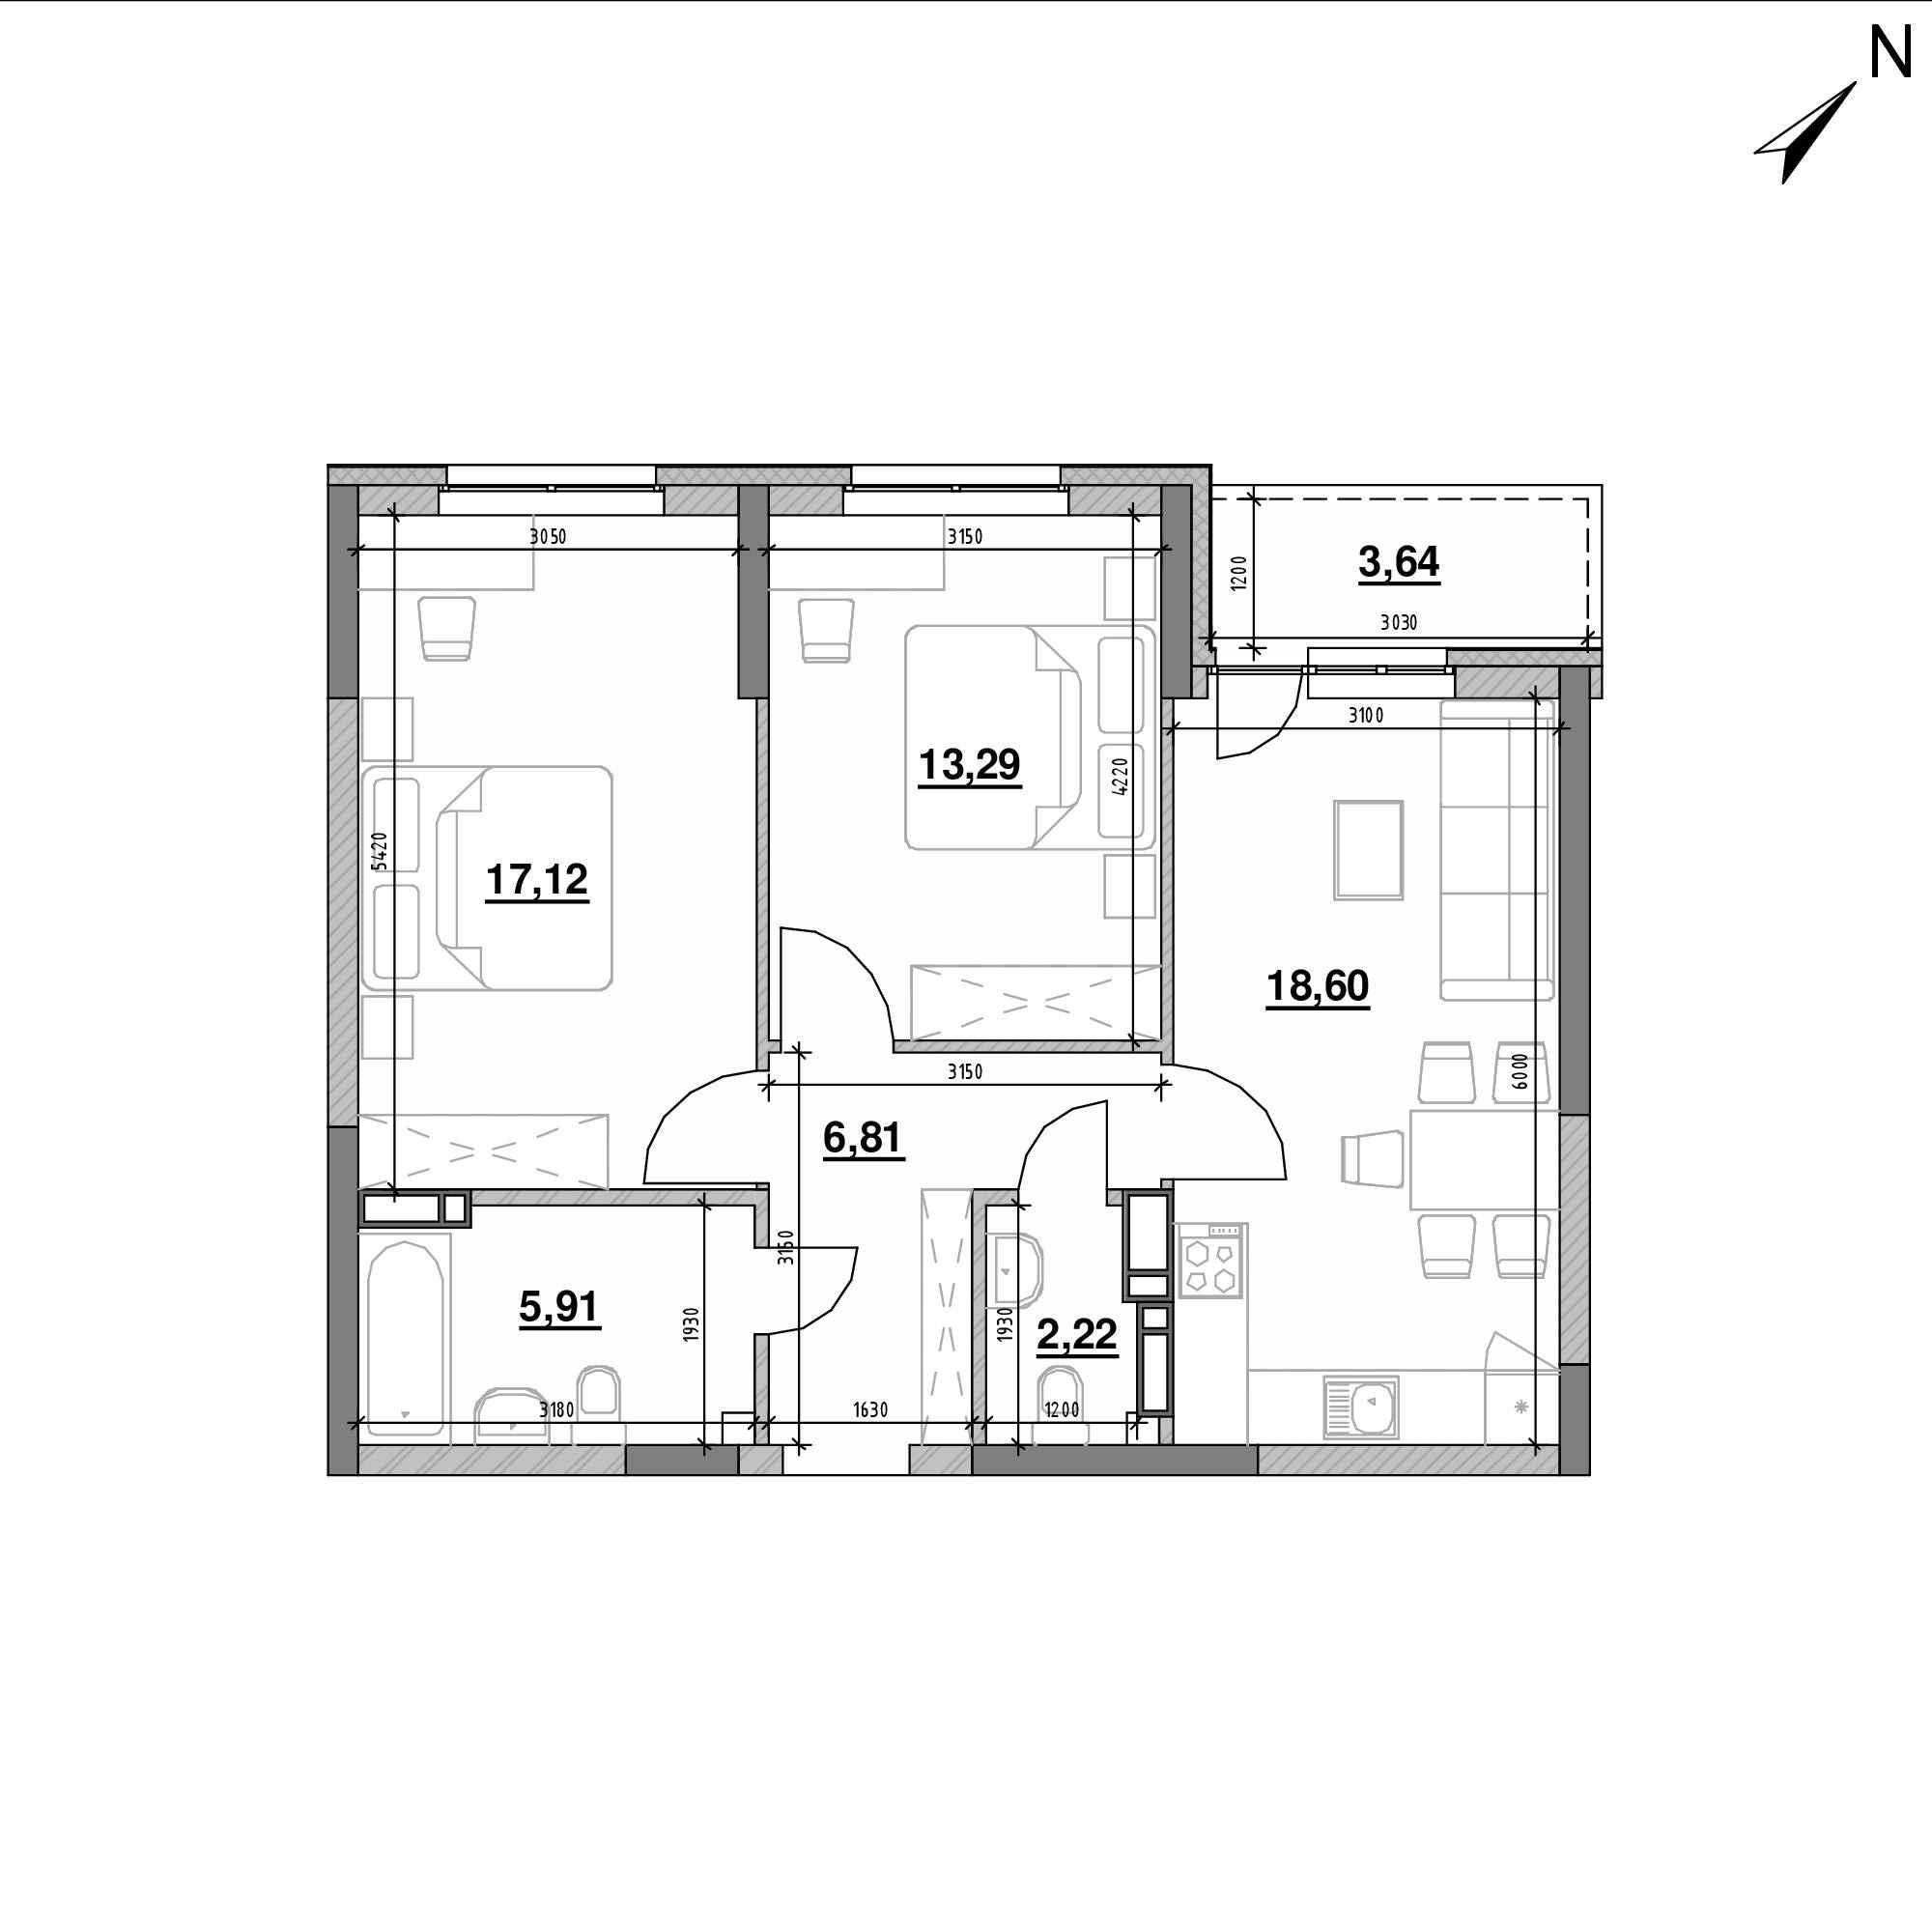 ЖК Оk'Land: планування 2-кімнатної квартири, №300, 67.59 м<sup>2</sup>